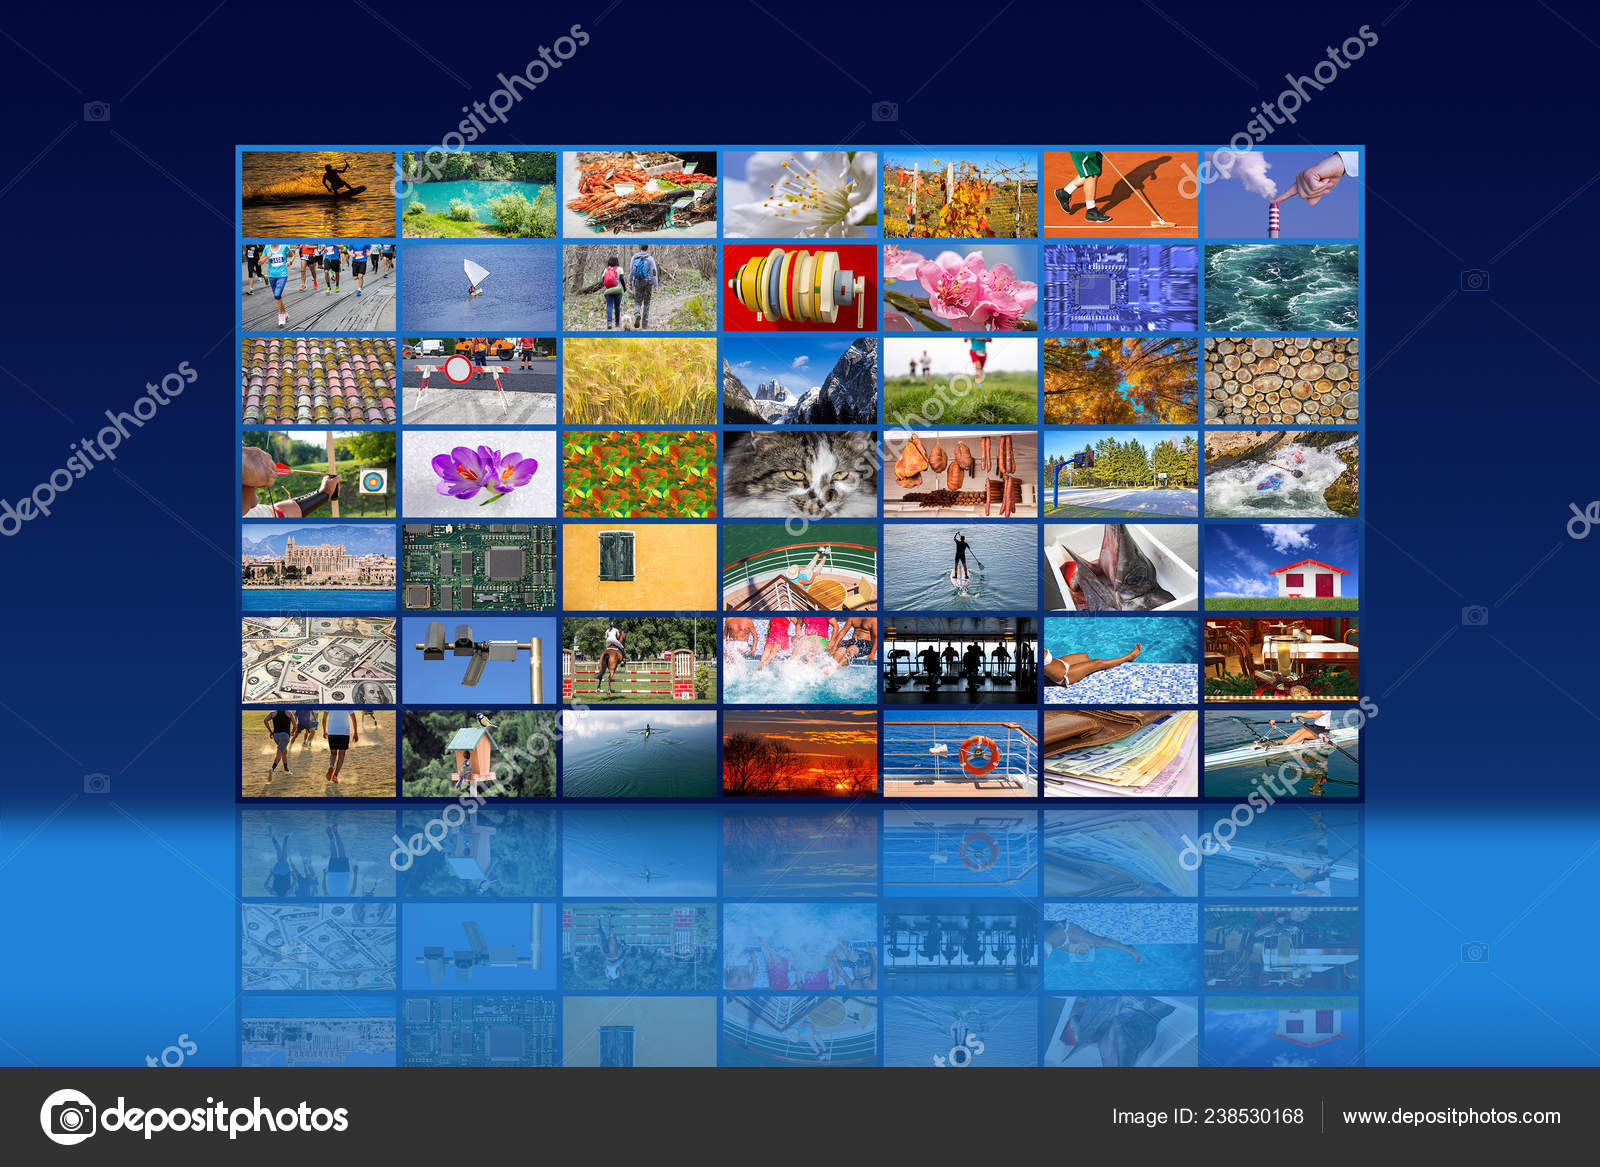 Big Multimedia Video Wall Widescreen Web Streaming Media